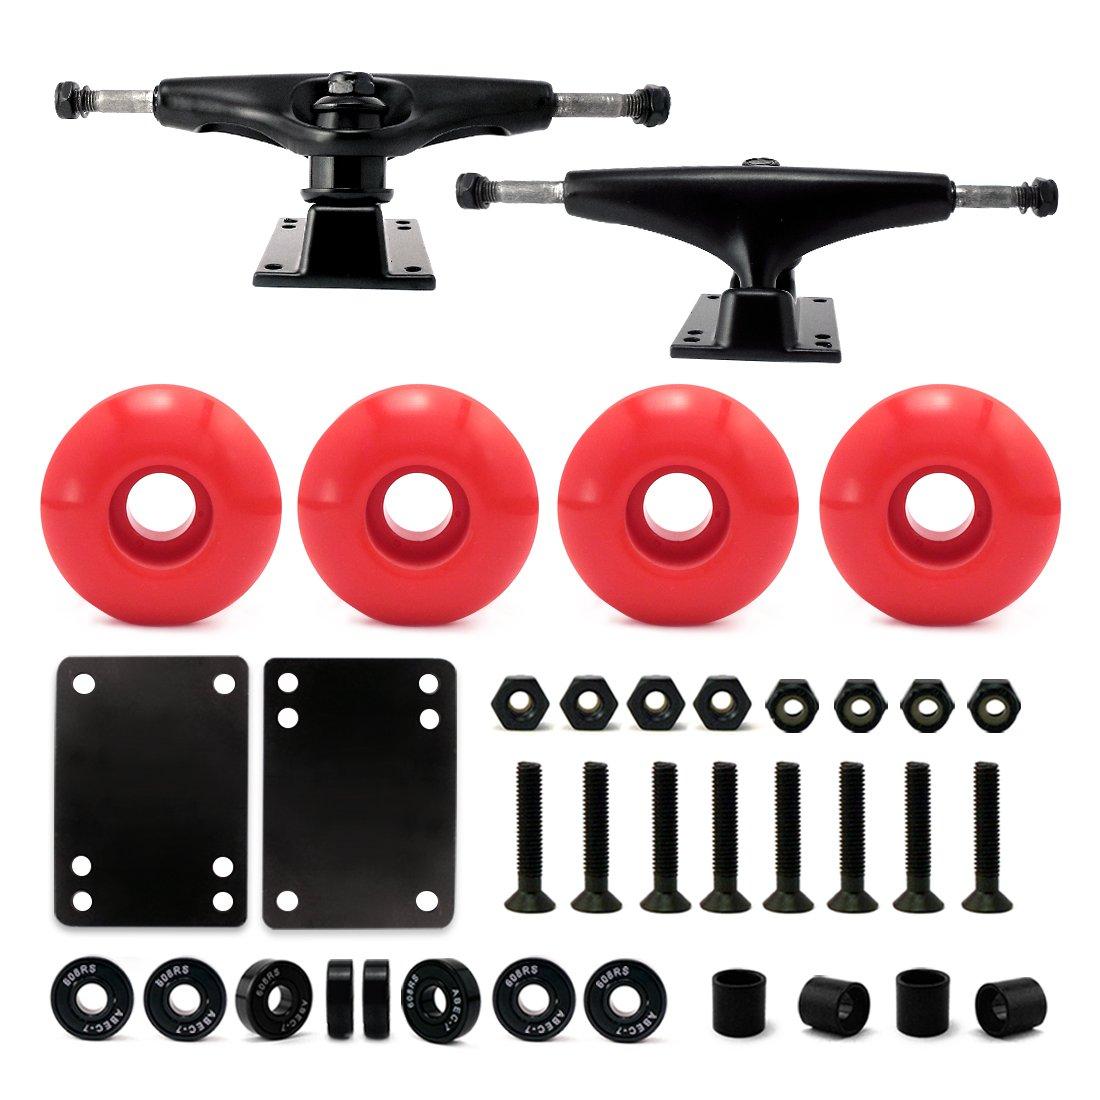 VJ 5.0 Skateboard Trucks (Black), Skateboard Wheels 52mm, Skateboard Bearings, Skateboard Pads, Skateboard Hardware 1'' (52mm red) by VJ